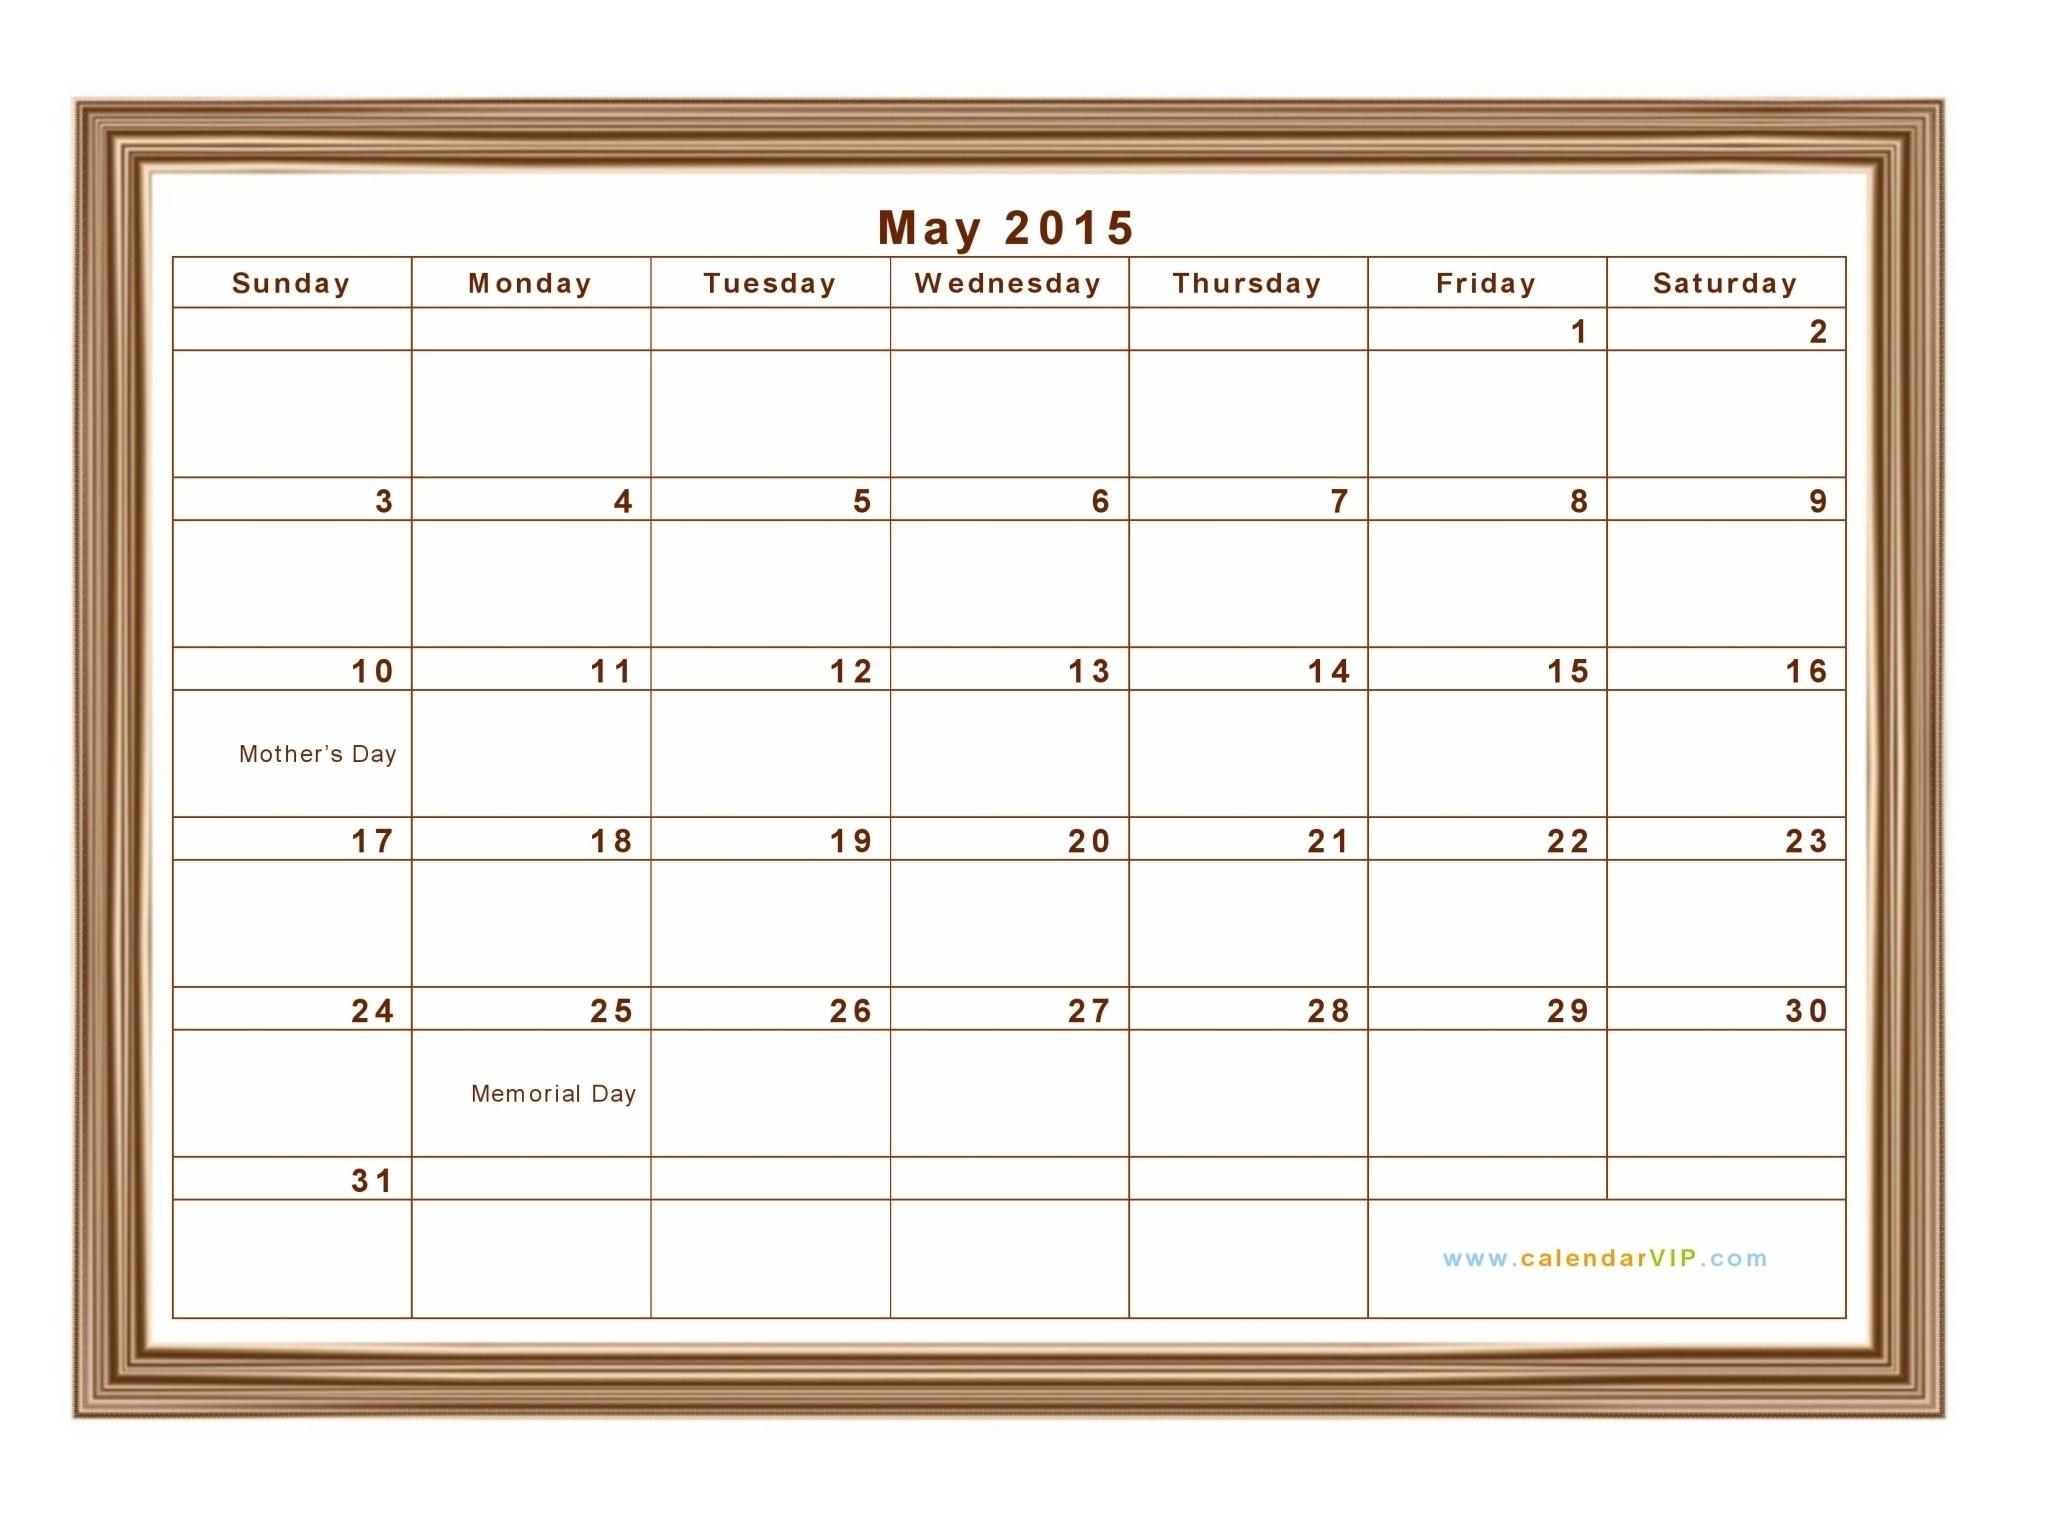 Calendar Doc May 2015 | Custom Calendar Usa throughout Blank Time And Date Calendar